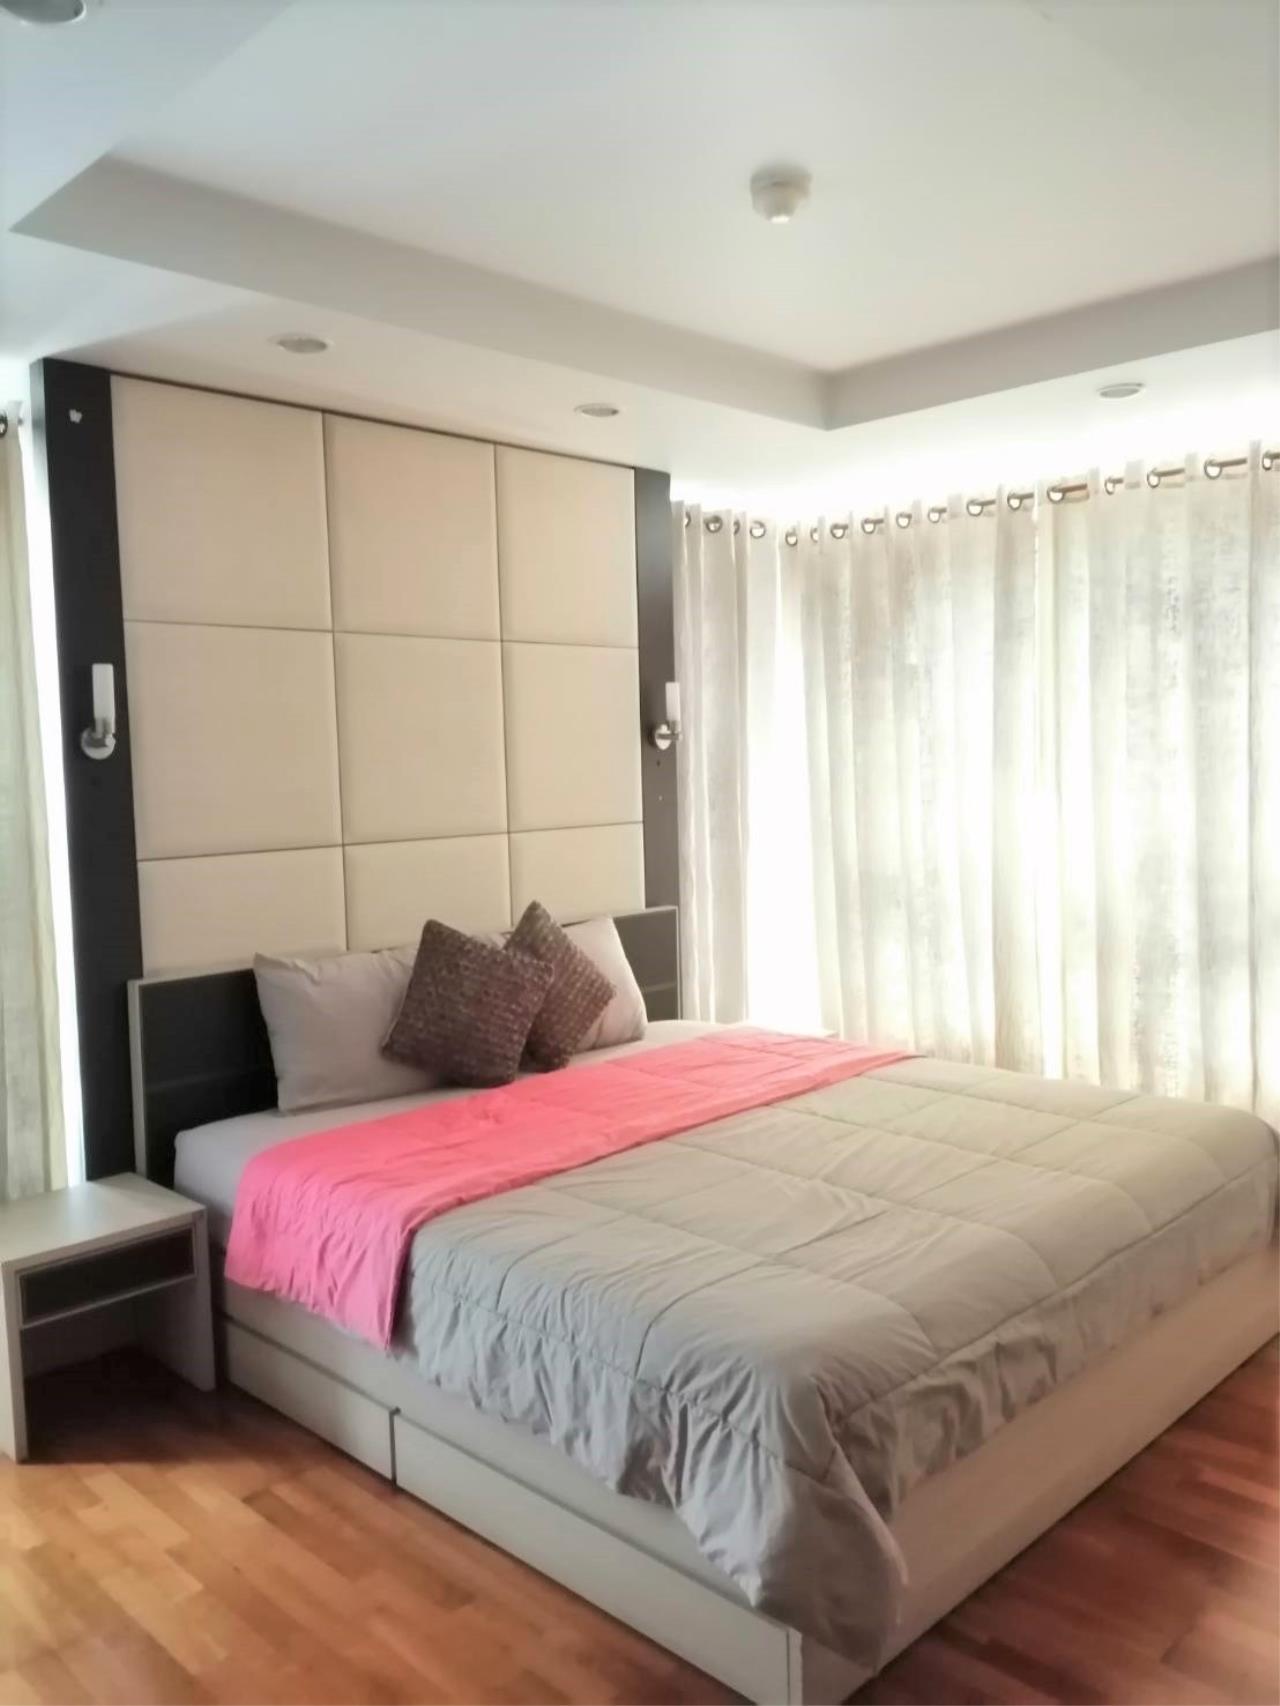 Blueocean property Agency's Condo For Rent – Avenue 61 Condominium 14